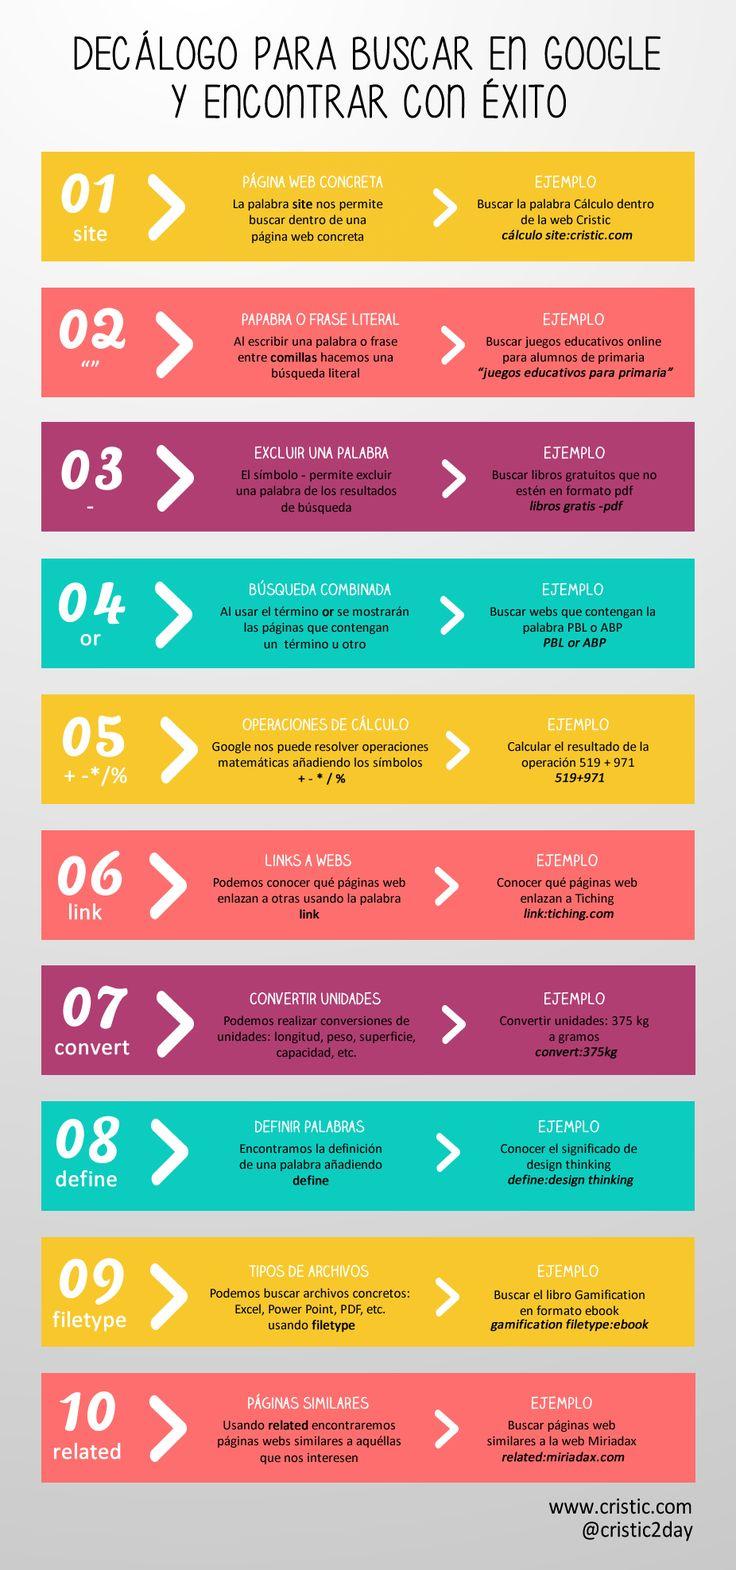 Decálogo para buscar en Google. 10 trucos para buscar en Google y encontrar con éxito